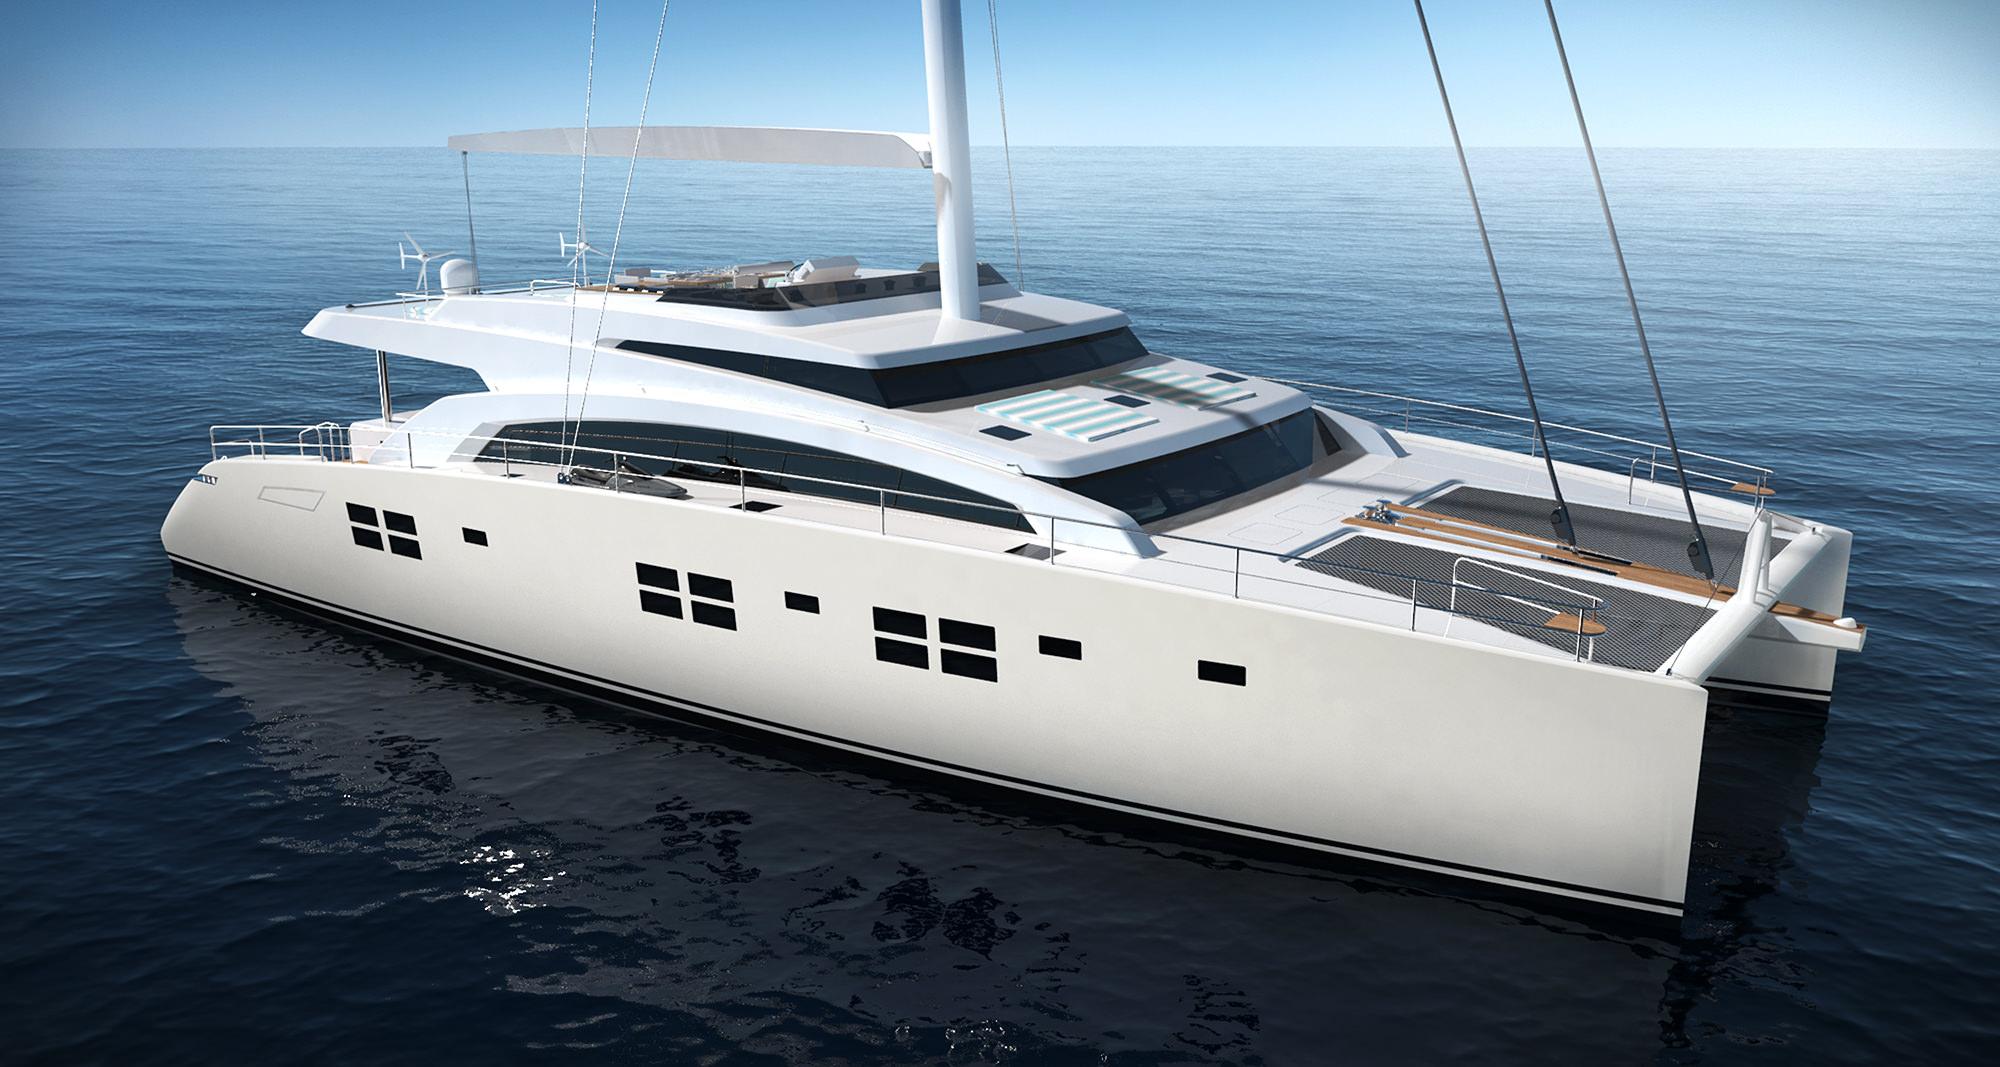 Sunreef Catamaran 88DD Yacht Charter Amp Superyacht News